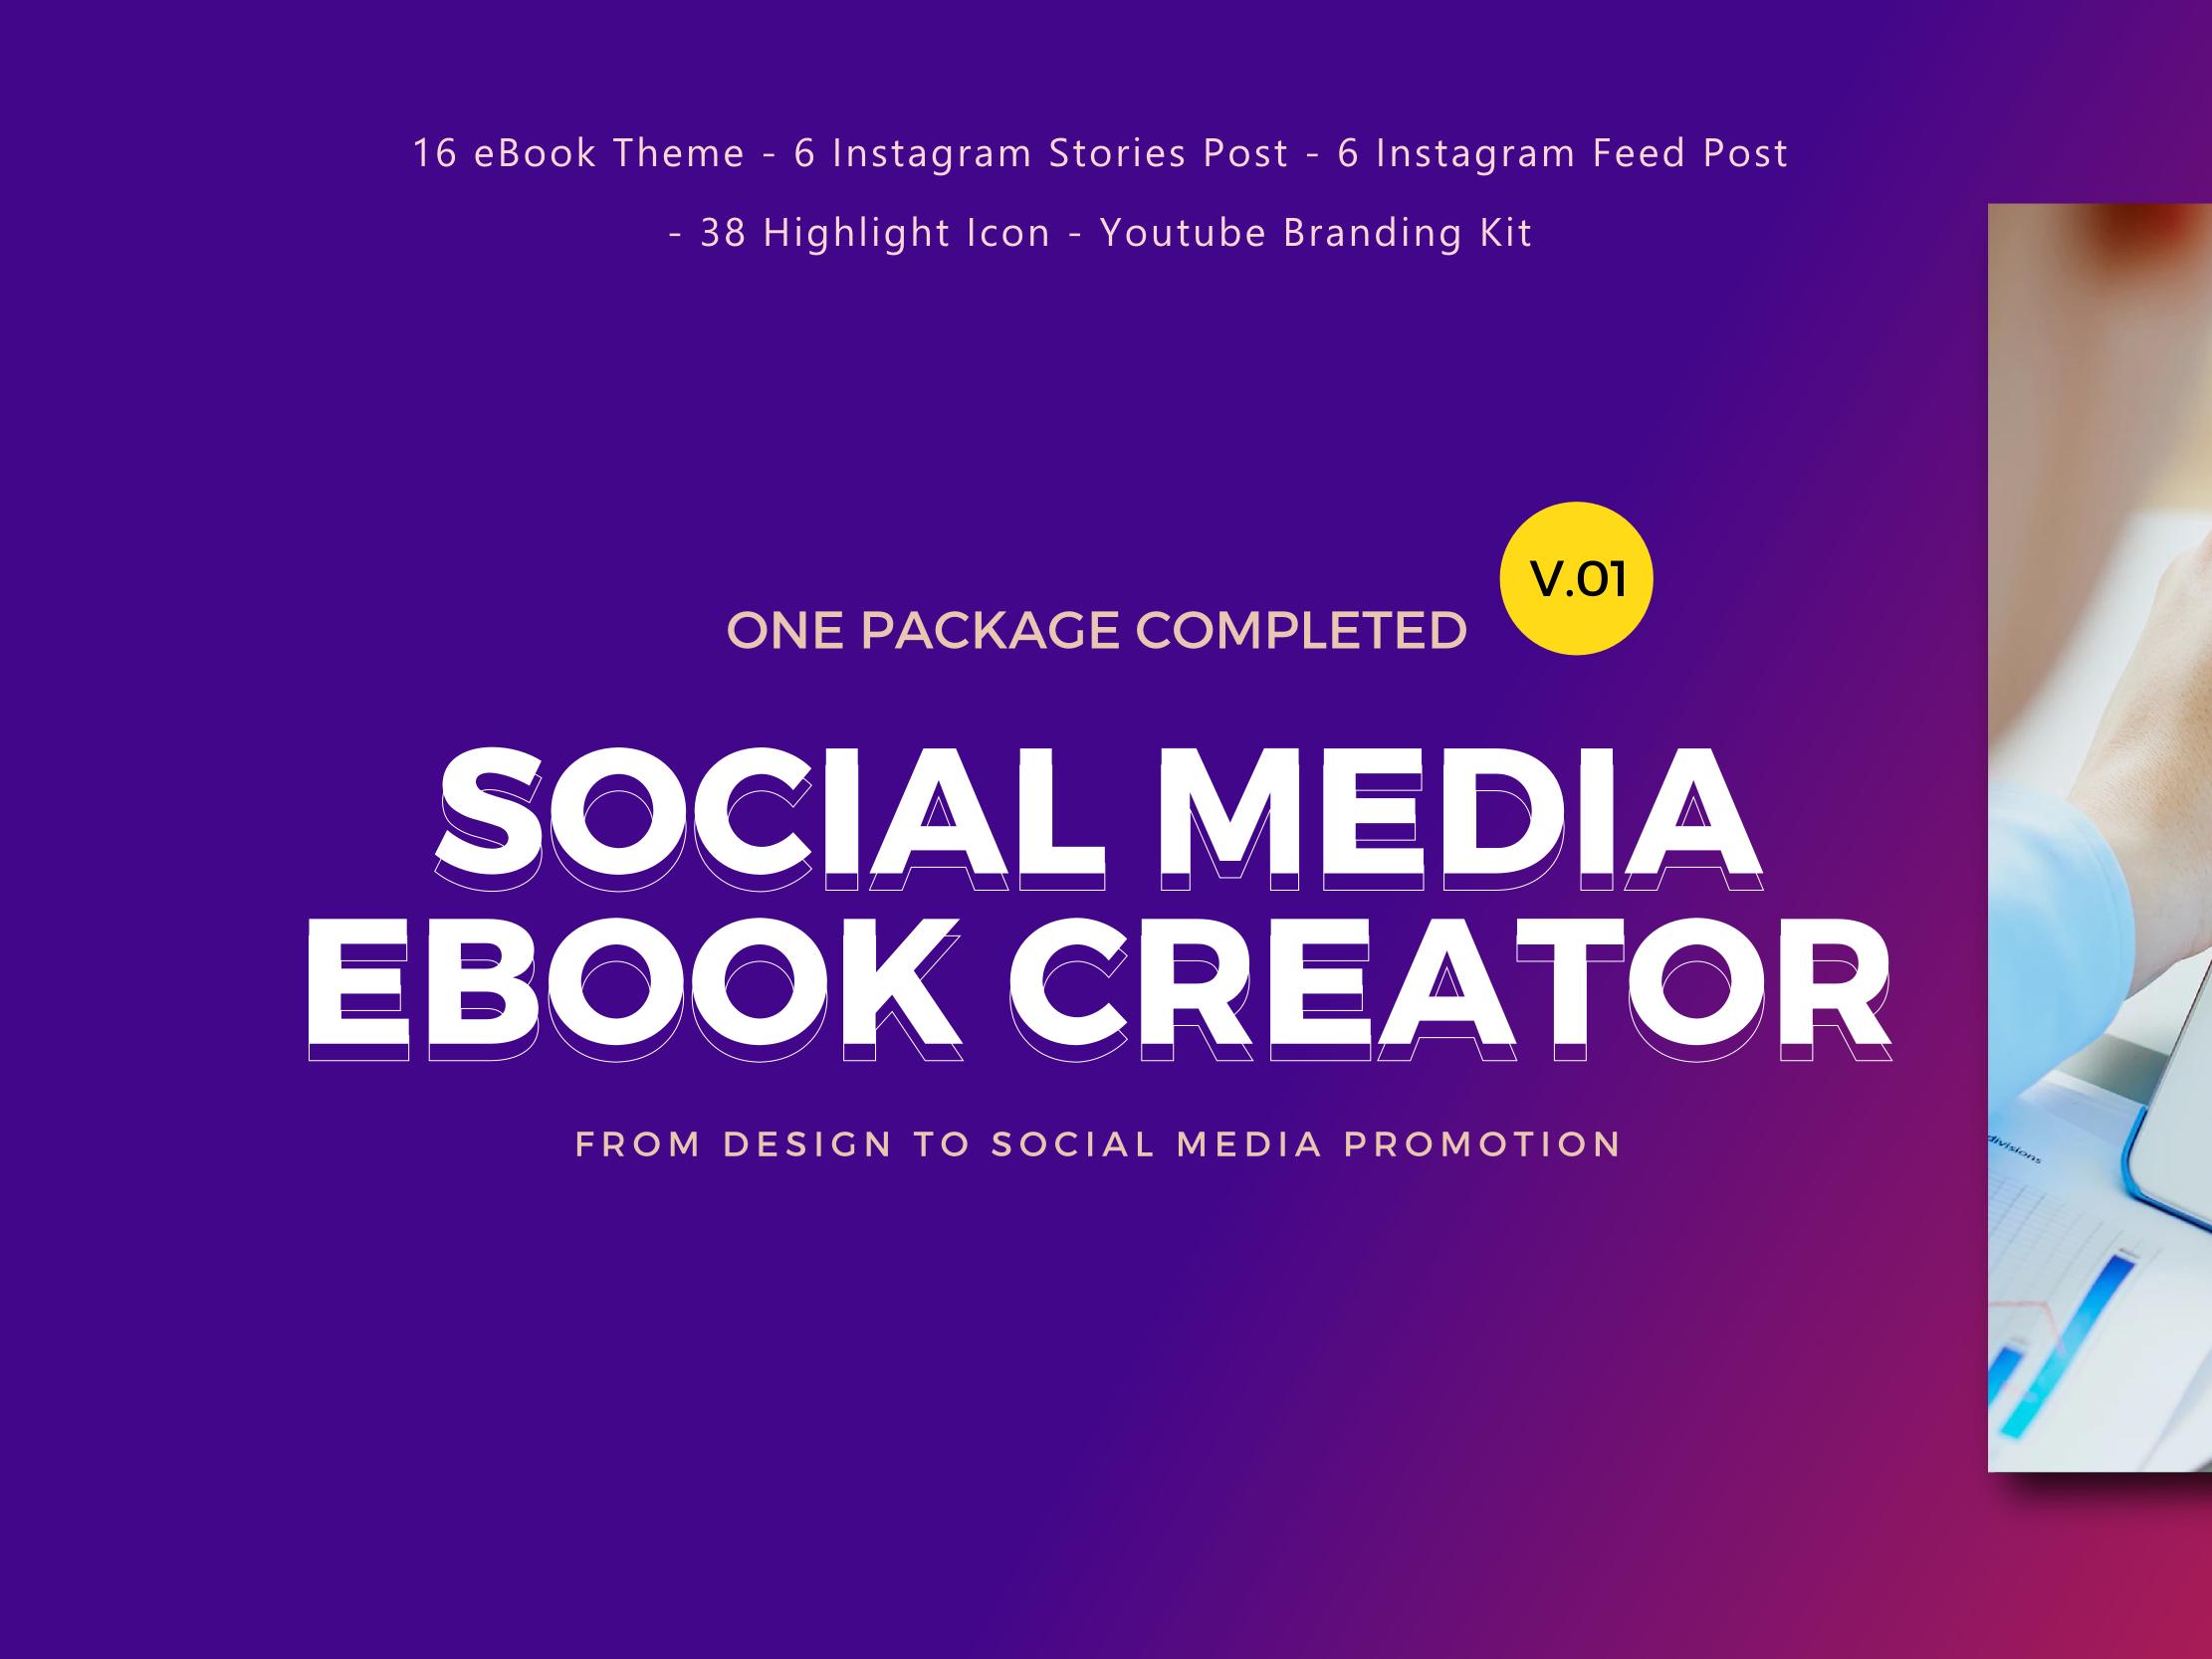 Social Media Marketing eBook Creator Template By rivatxfz ...